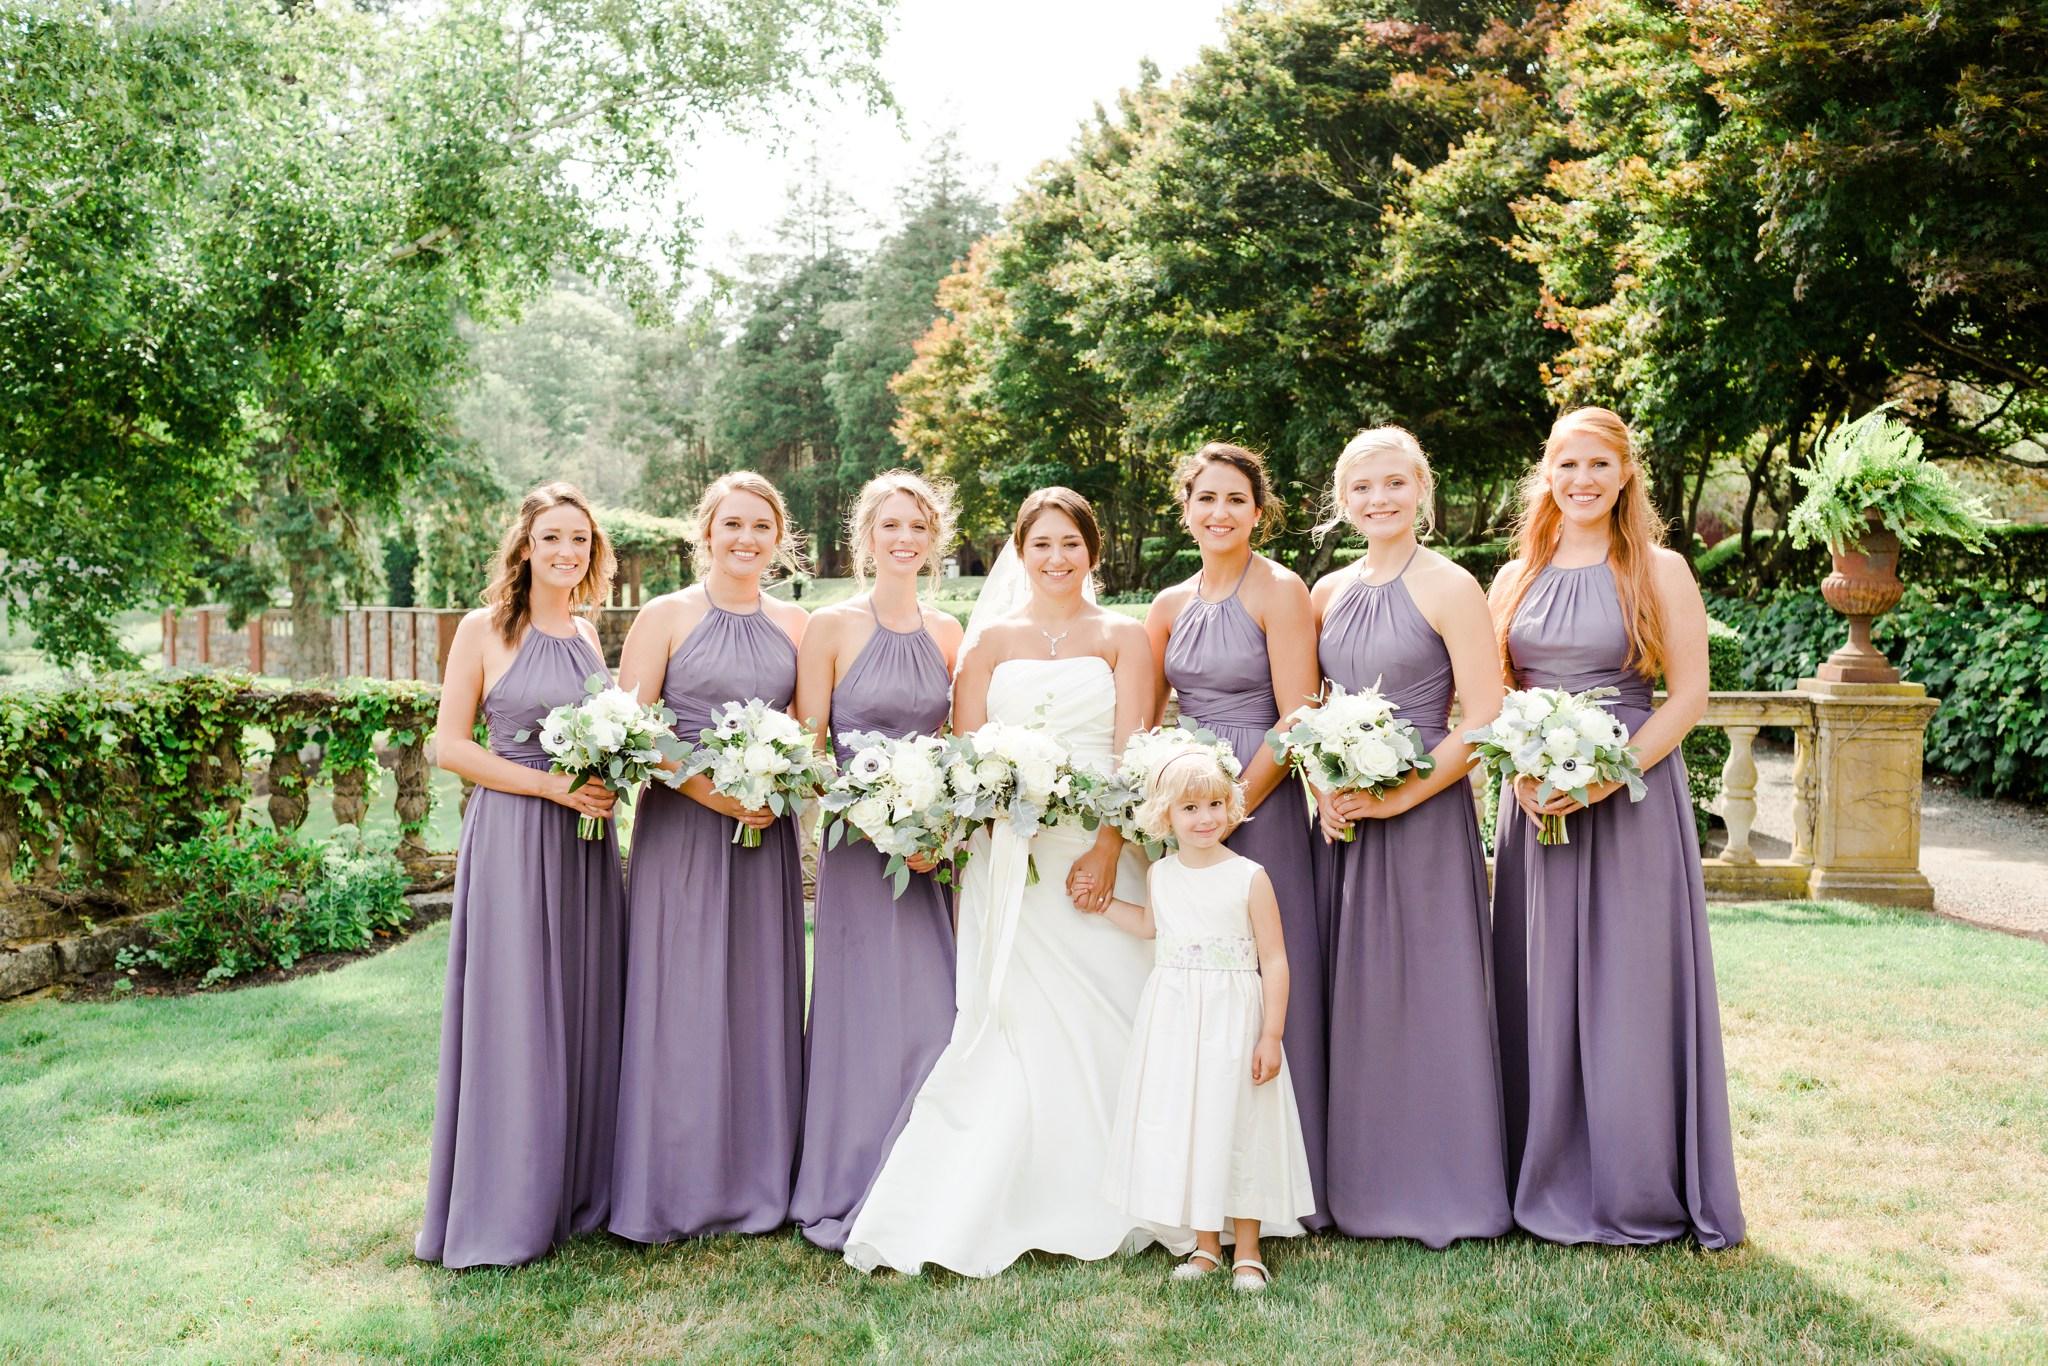 turner_hill_wedding_photos_00029.JPG